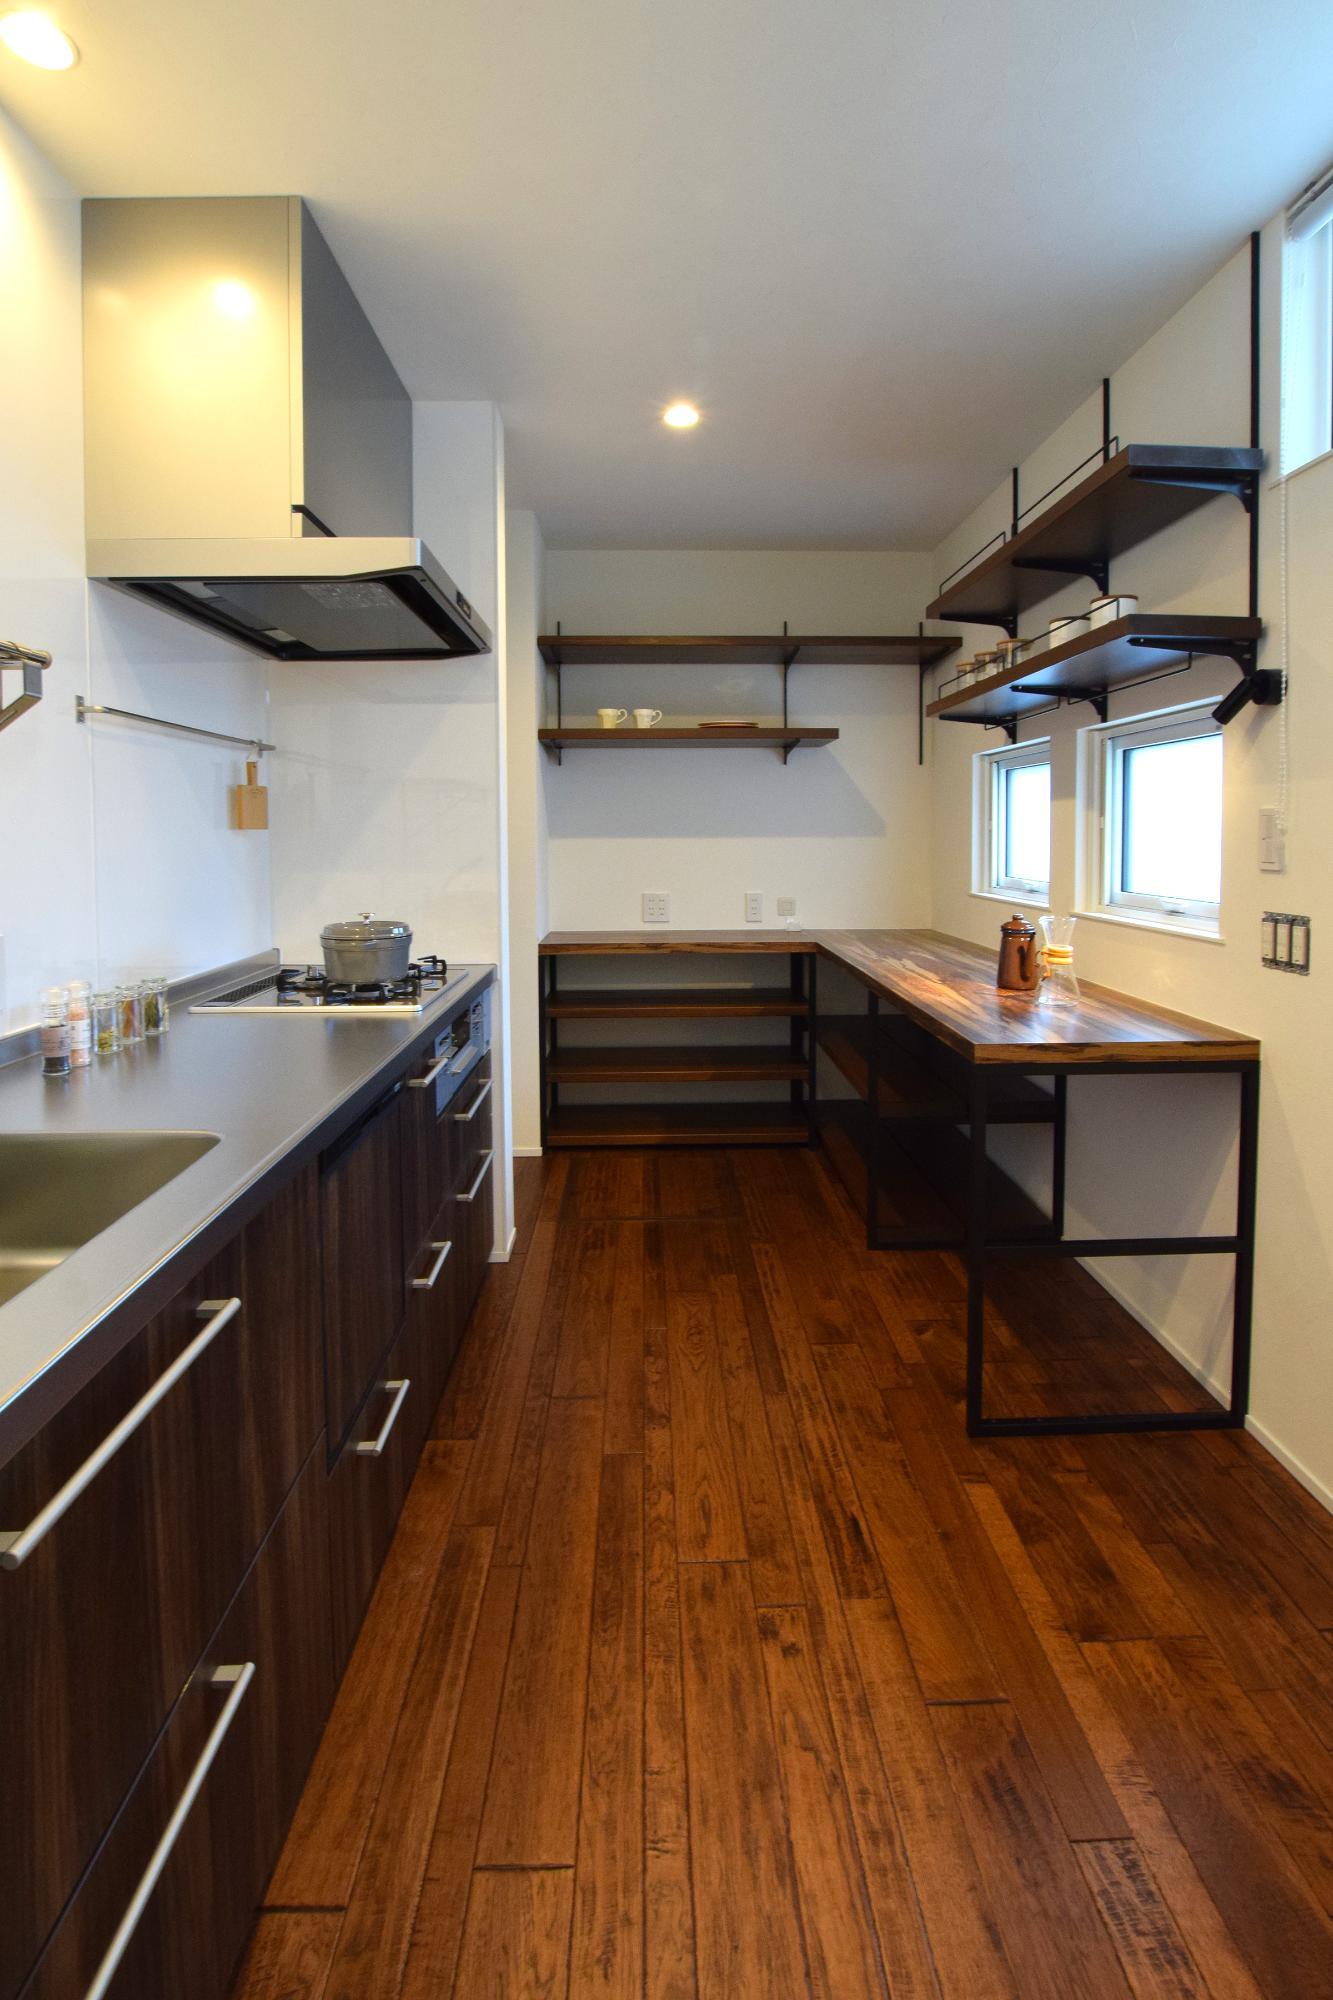 DETAIL HOME(ディテールホーム)「趣味を楽しむ家」のシンプル・ナチュラル・モダンなキッチンの実例写真